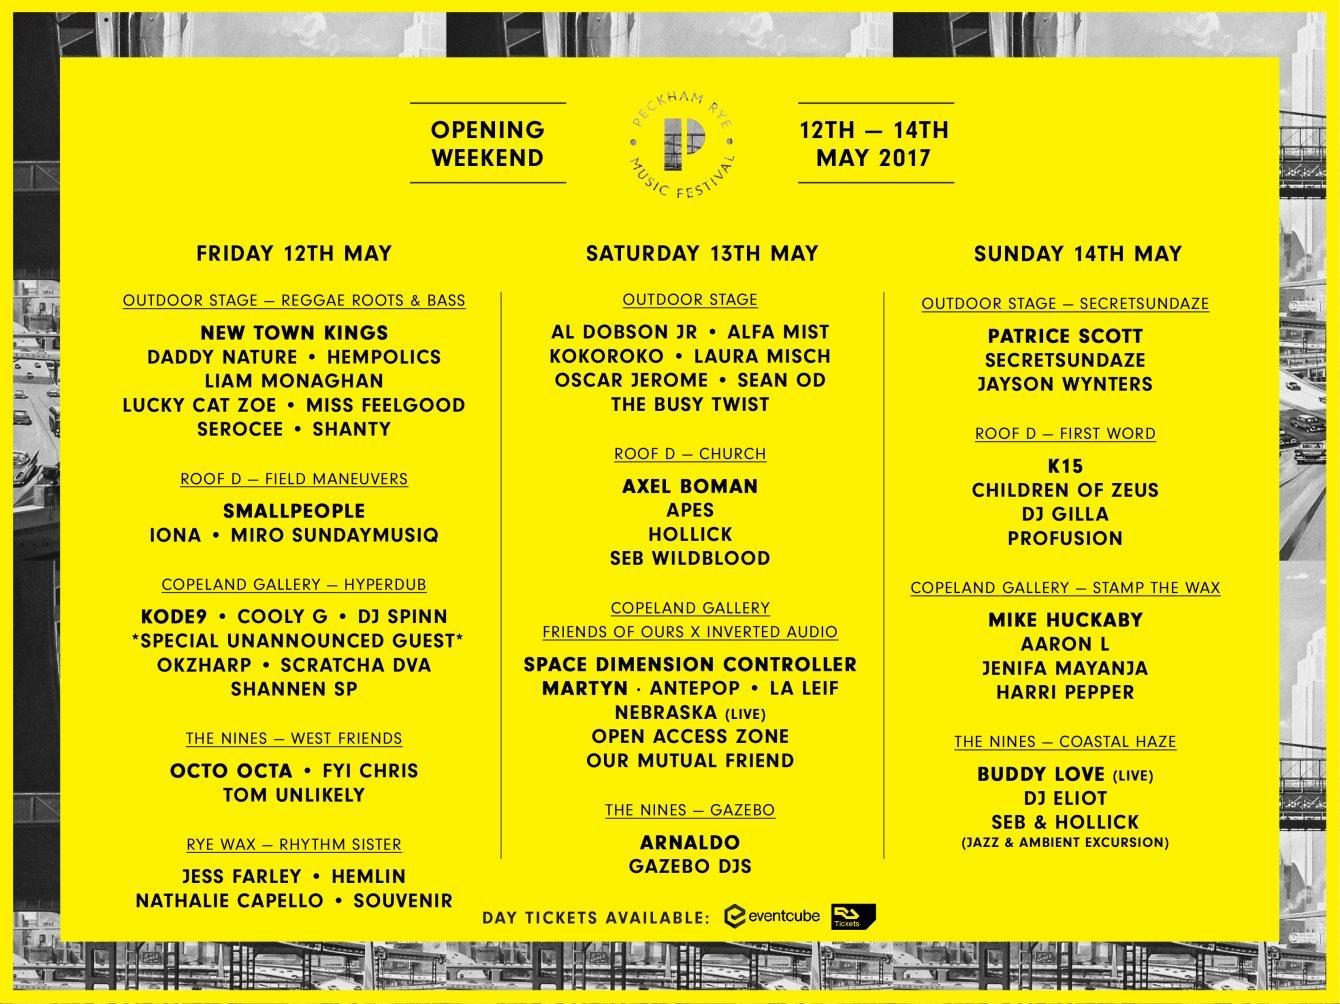 Peckham Rye Music Festival 2017 Opening Weekend - Flyer back